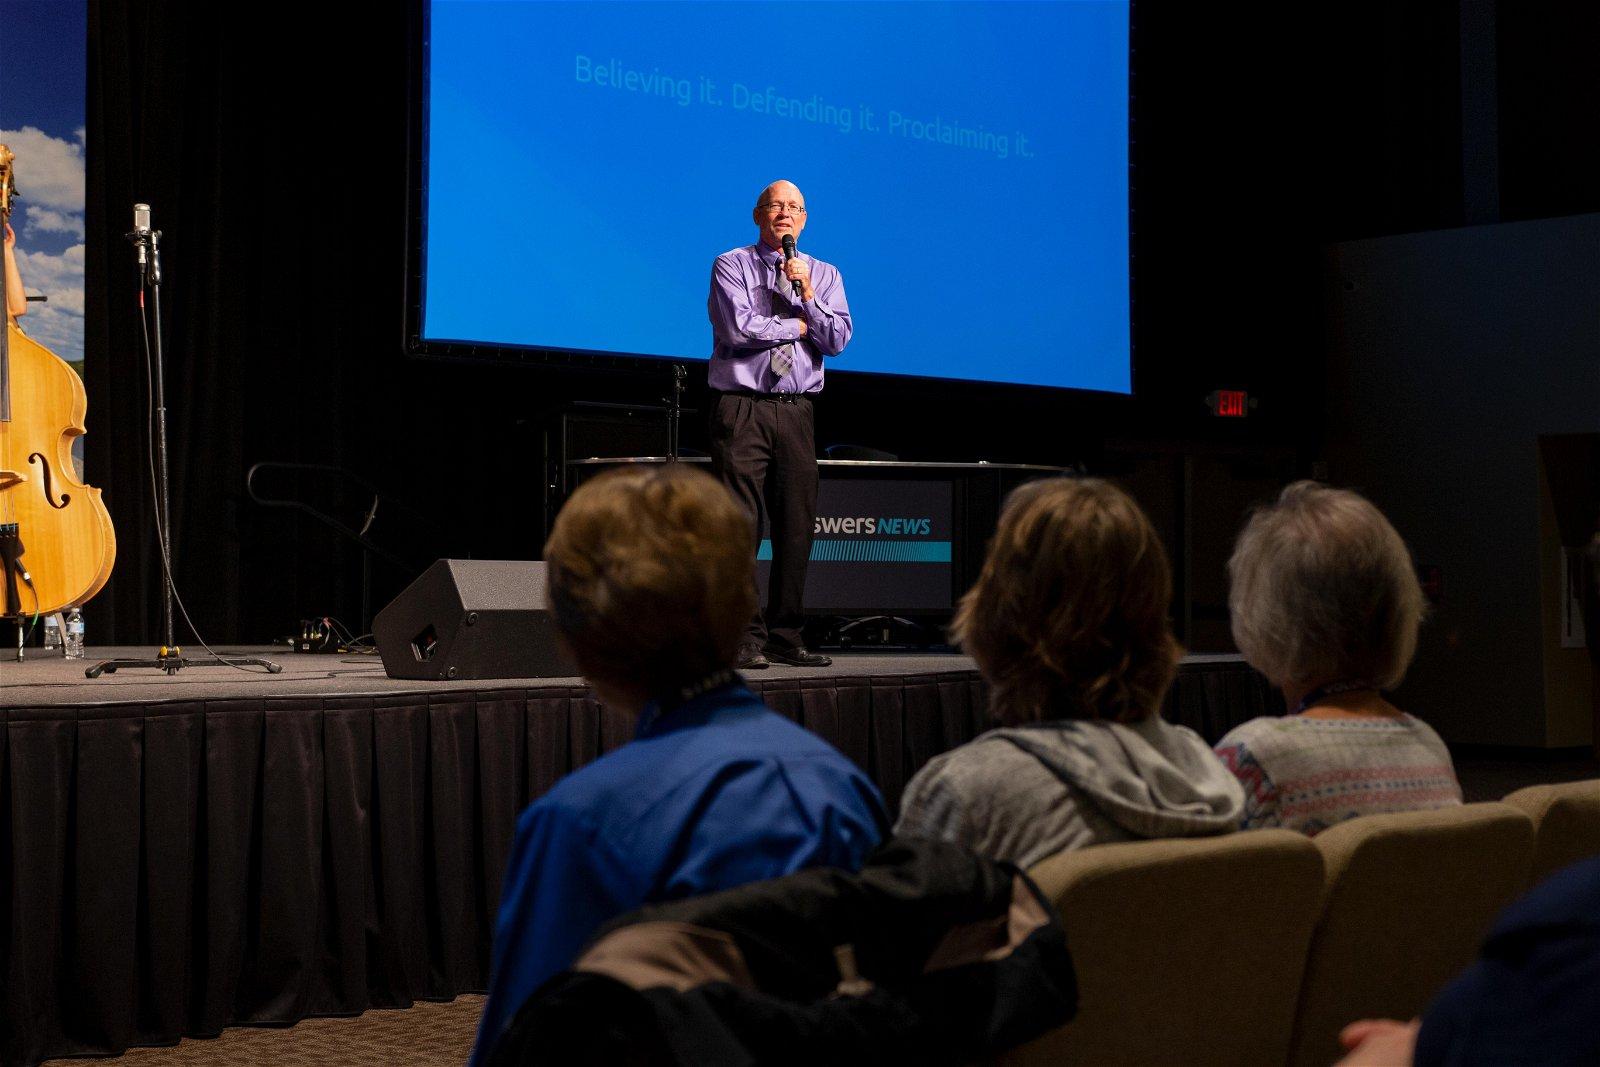 Mike Kingery Speaking